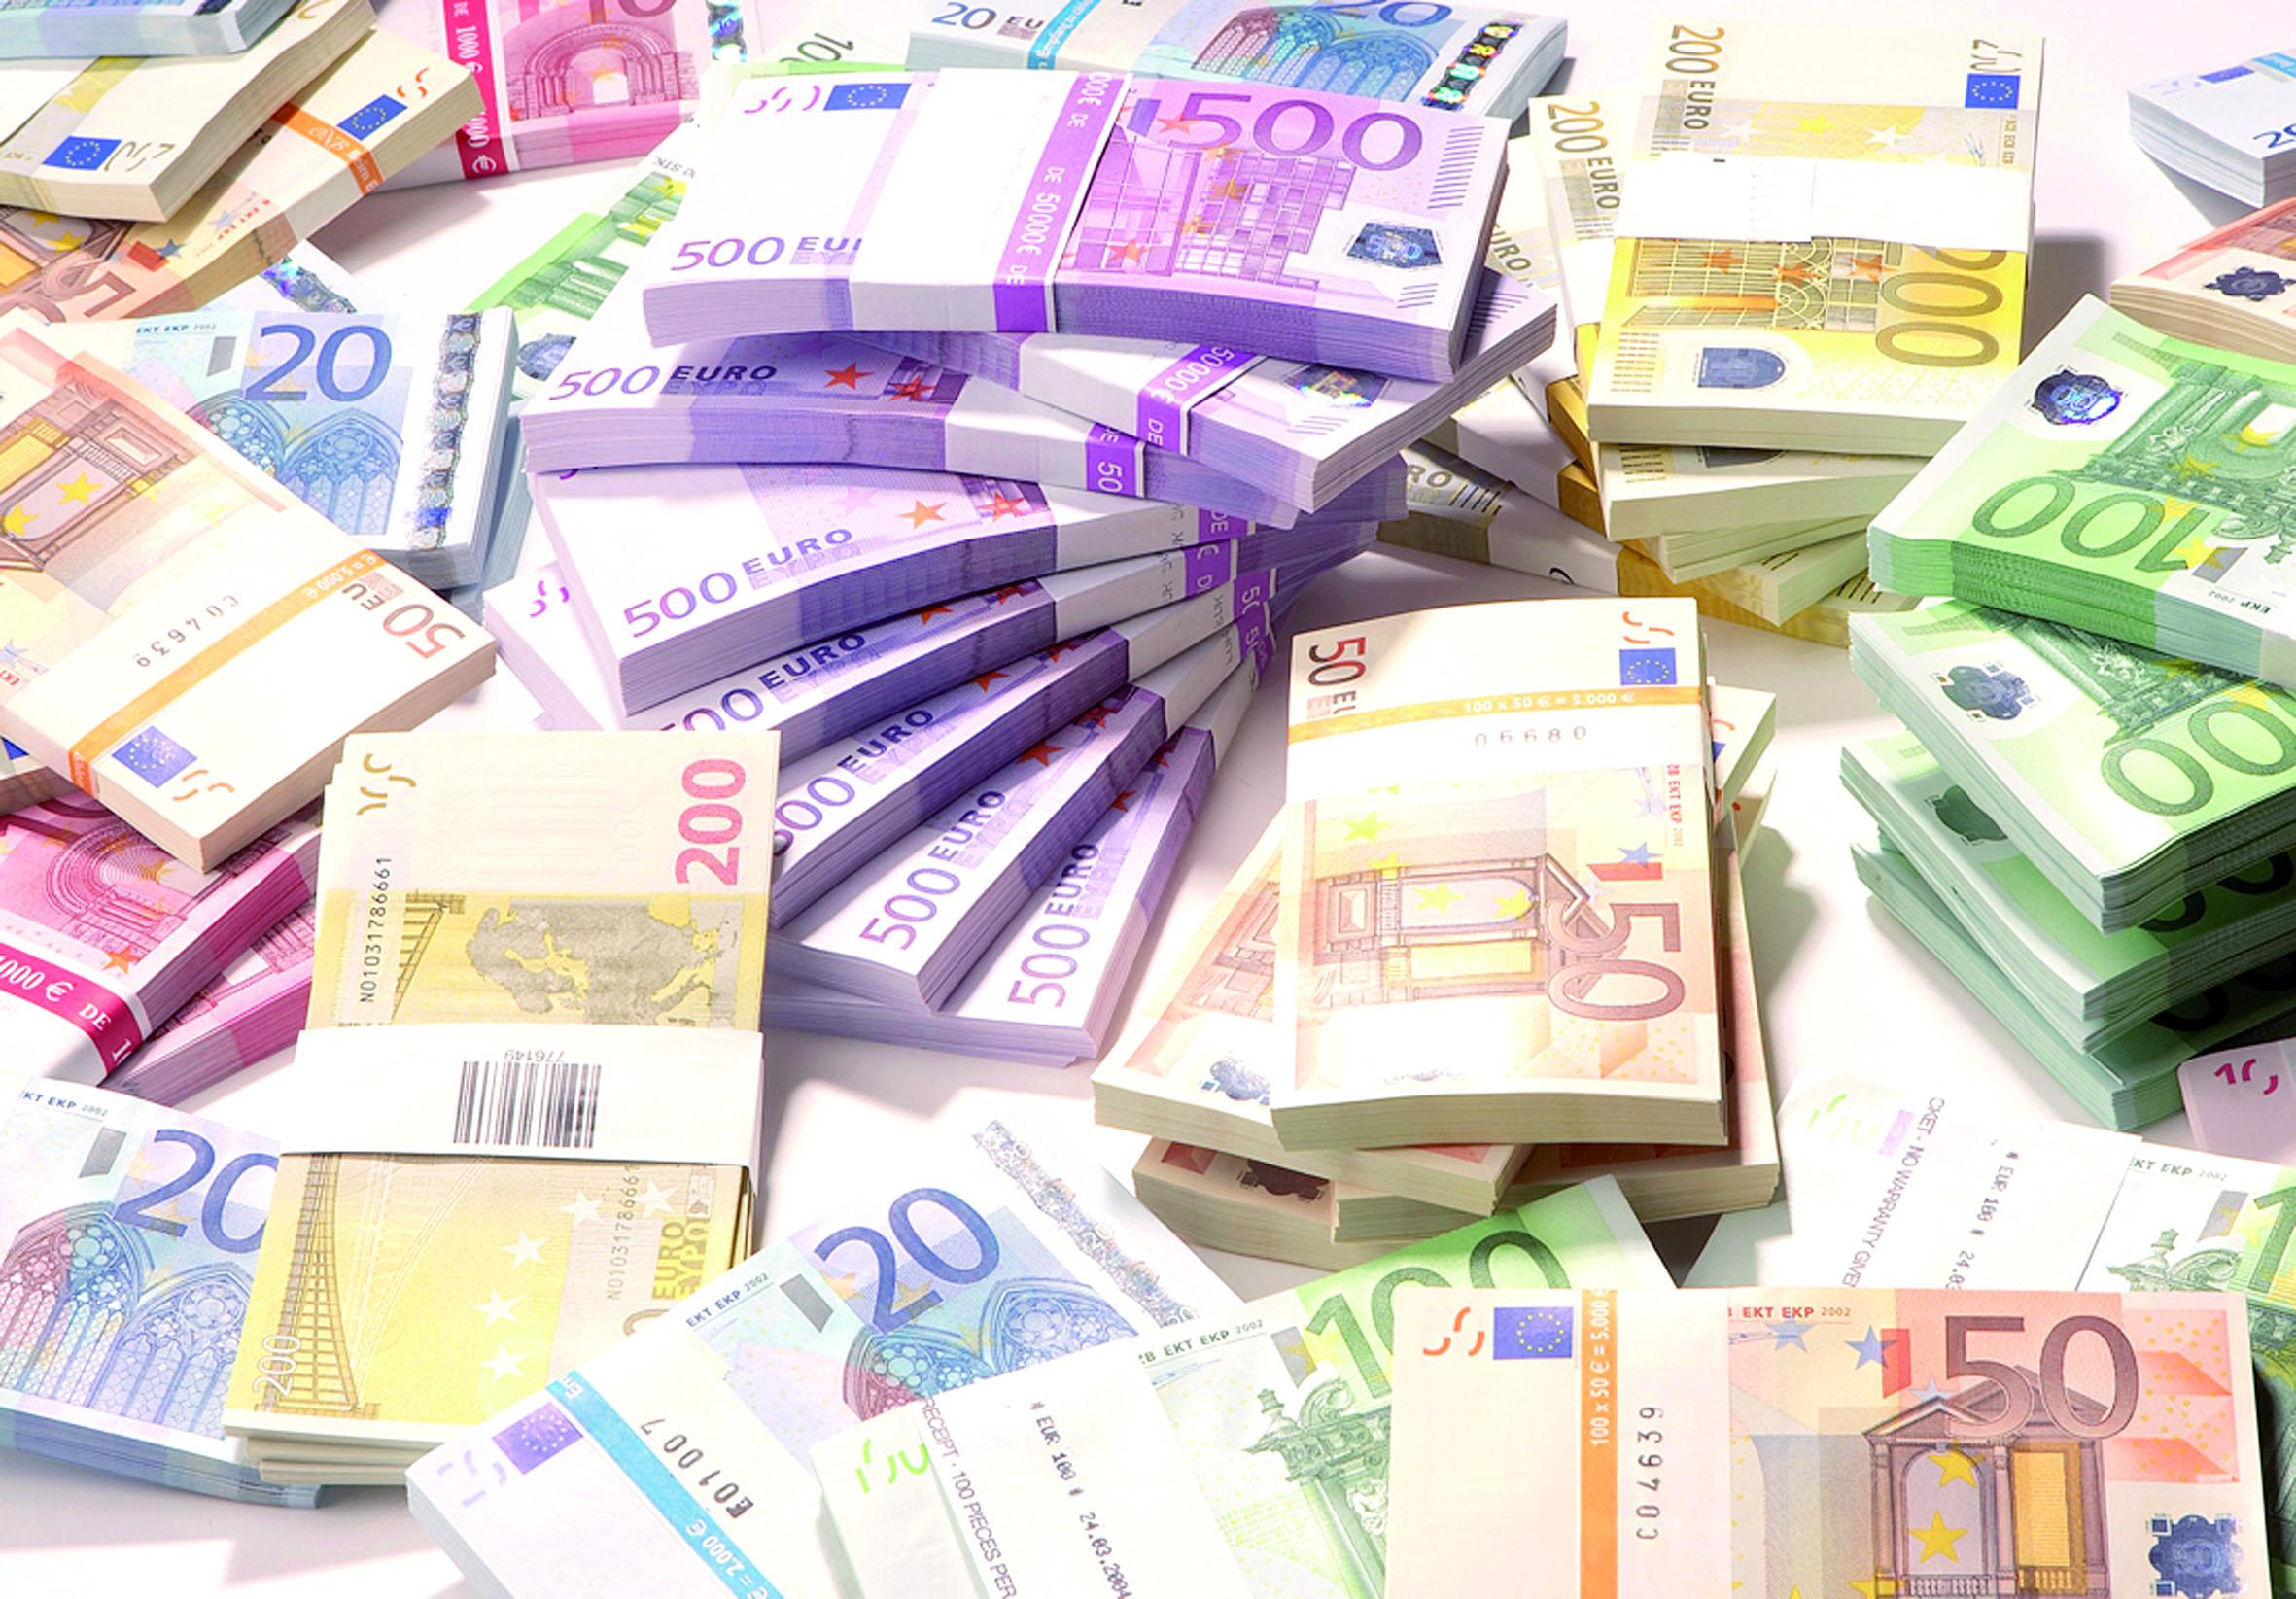 Tentatives de sortie illégale de plus de 33.000 euros à Bab Sebta